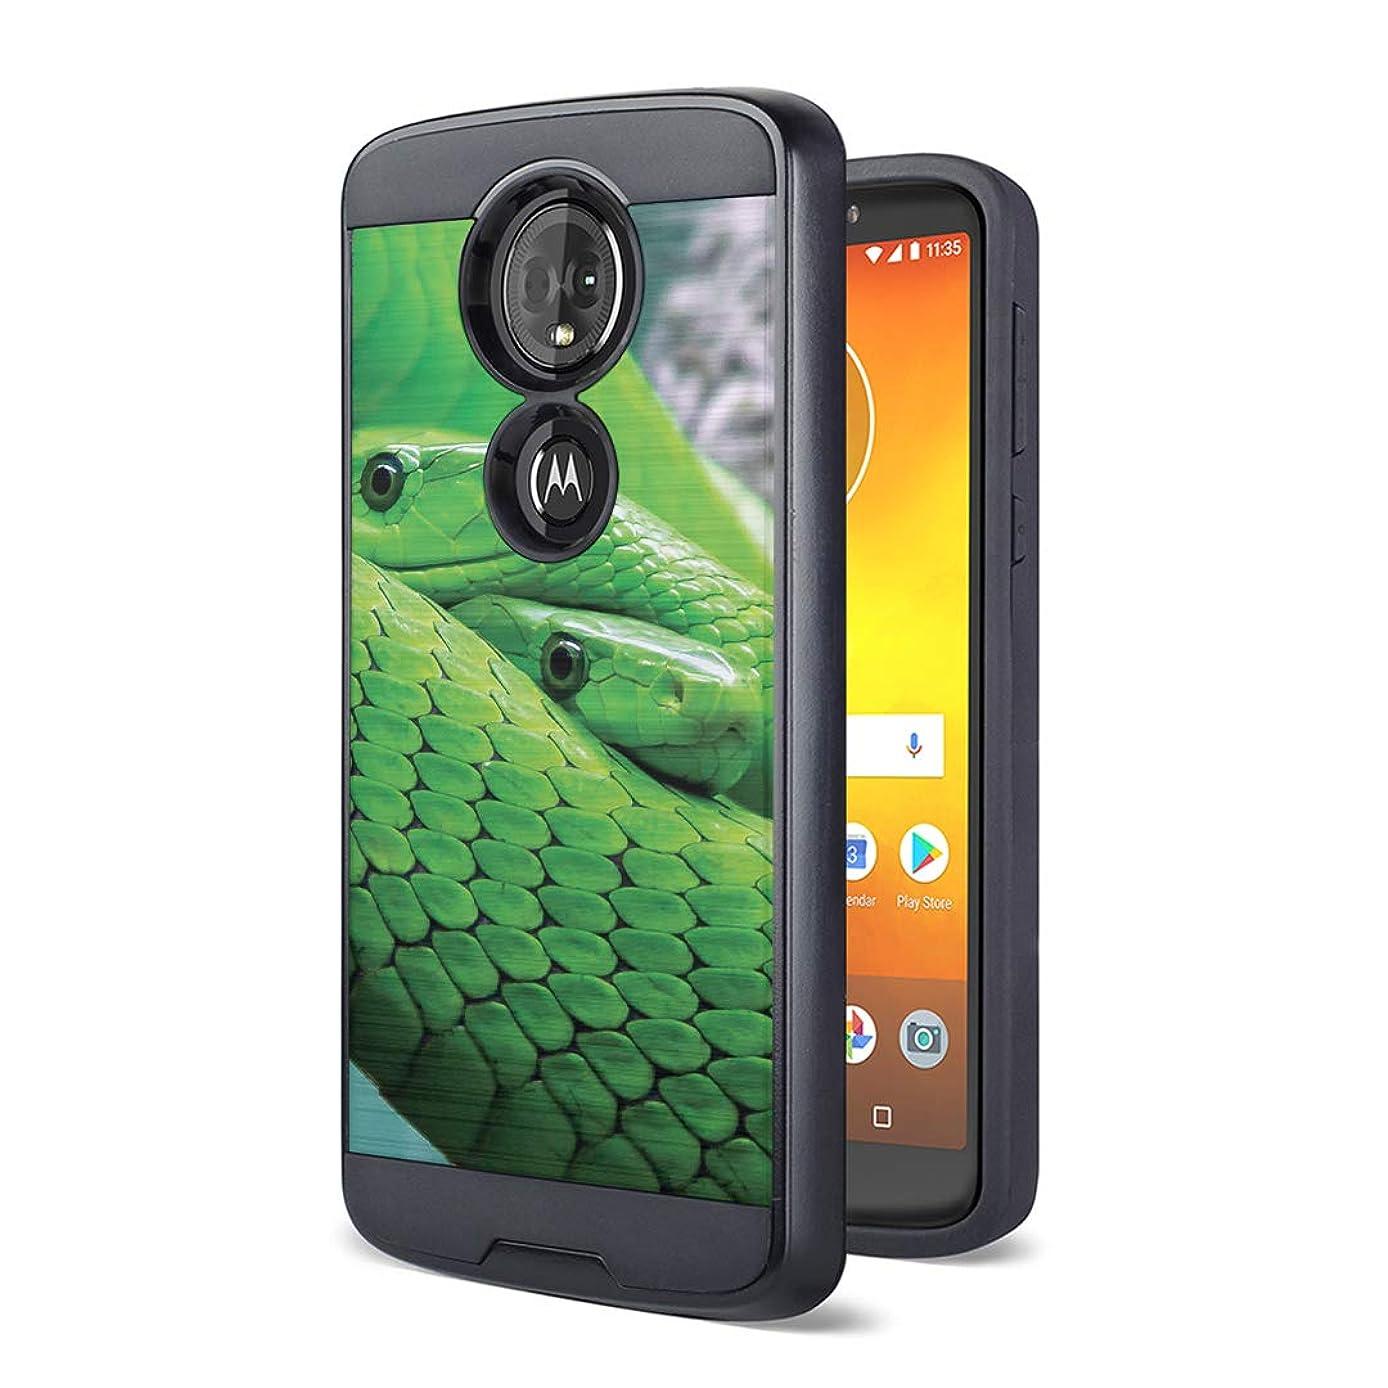 Moriko Case Compatible with Moto G7 Power, Moto G7 Supra [Drop Protection Fusion Dual Layer Slick Armor Case Black] for Motorola Moto G7 Power - (Mamba Snake)